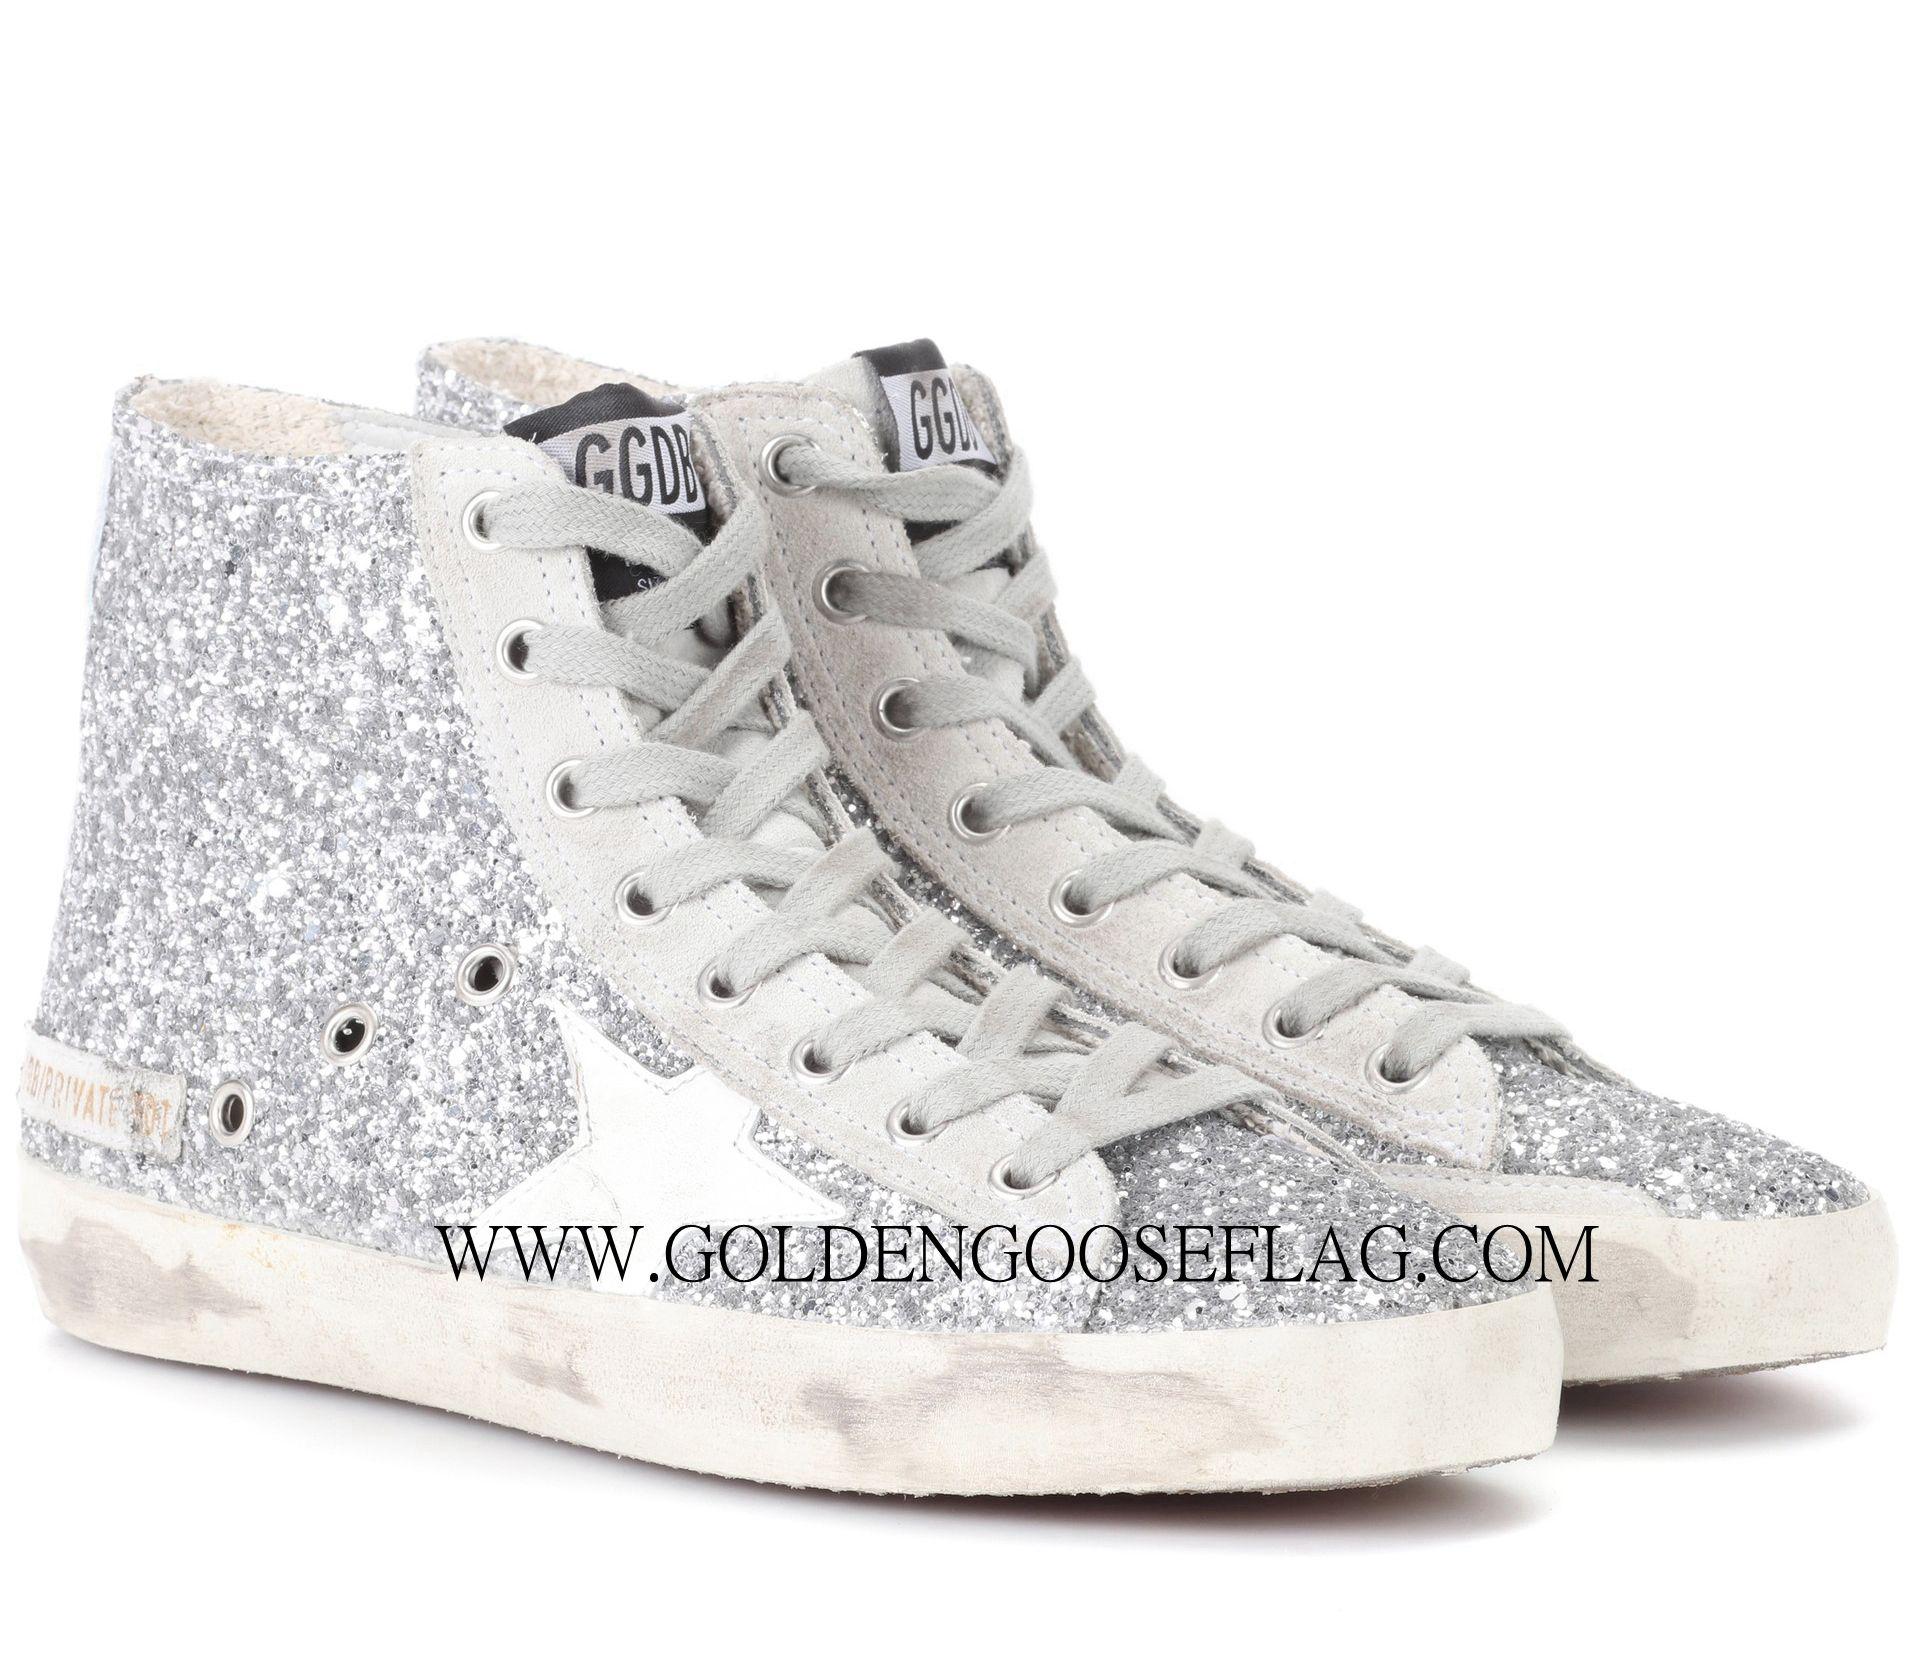 Golden GooseFlag Francy High-Top Sneakers R4DXVzNpP